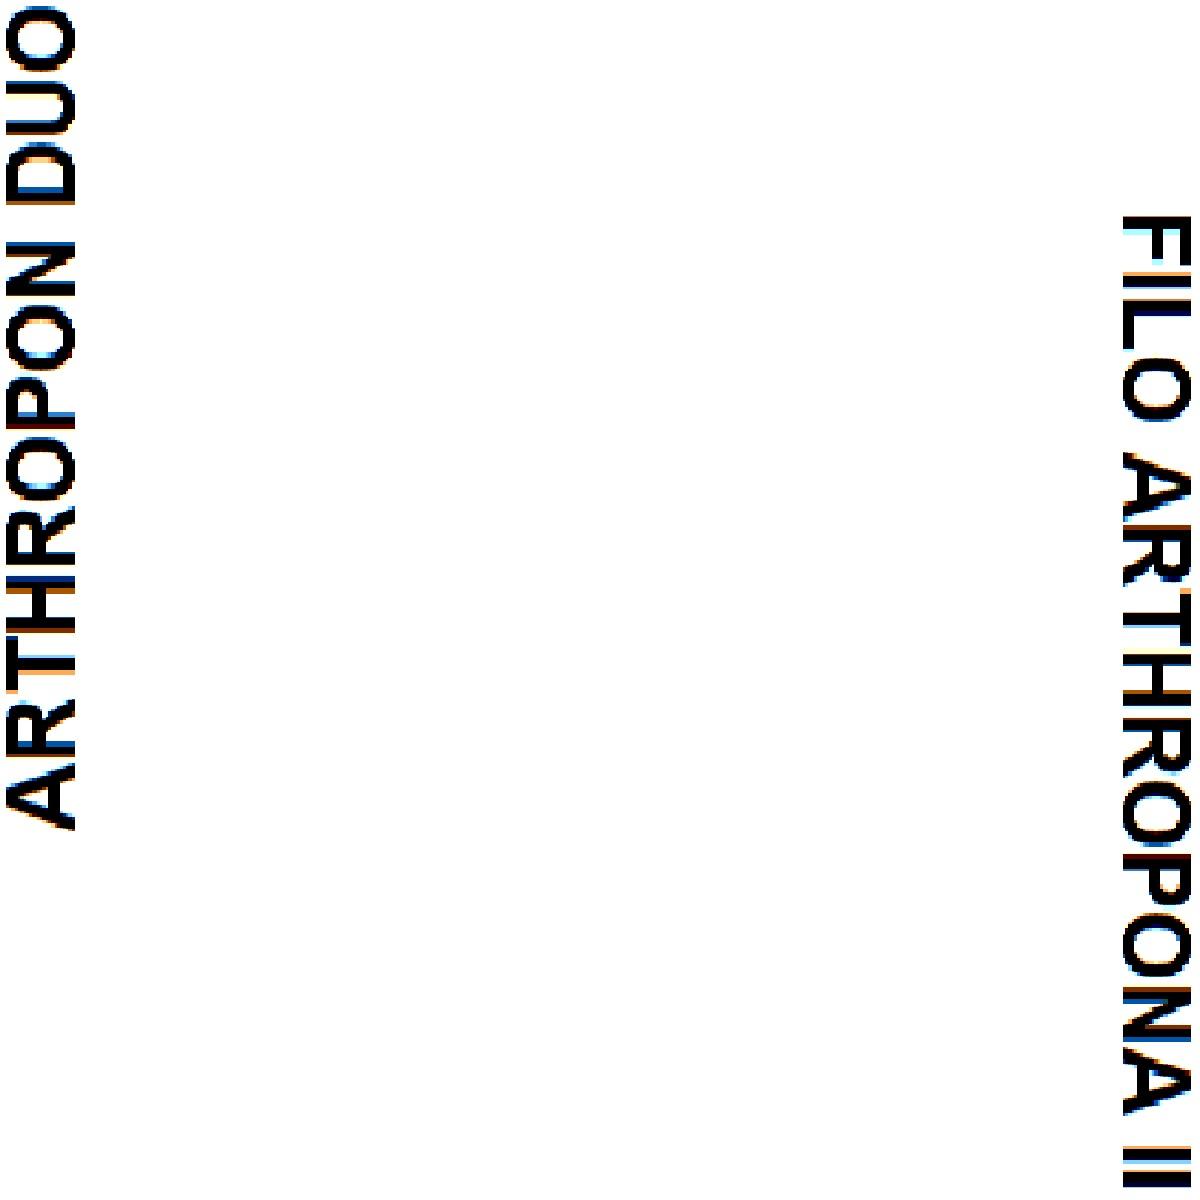 MSRCD016 - Arthropon Duo - Filo Arthropona II